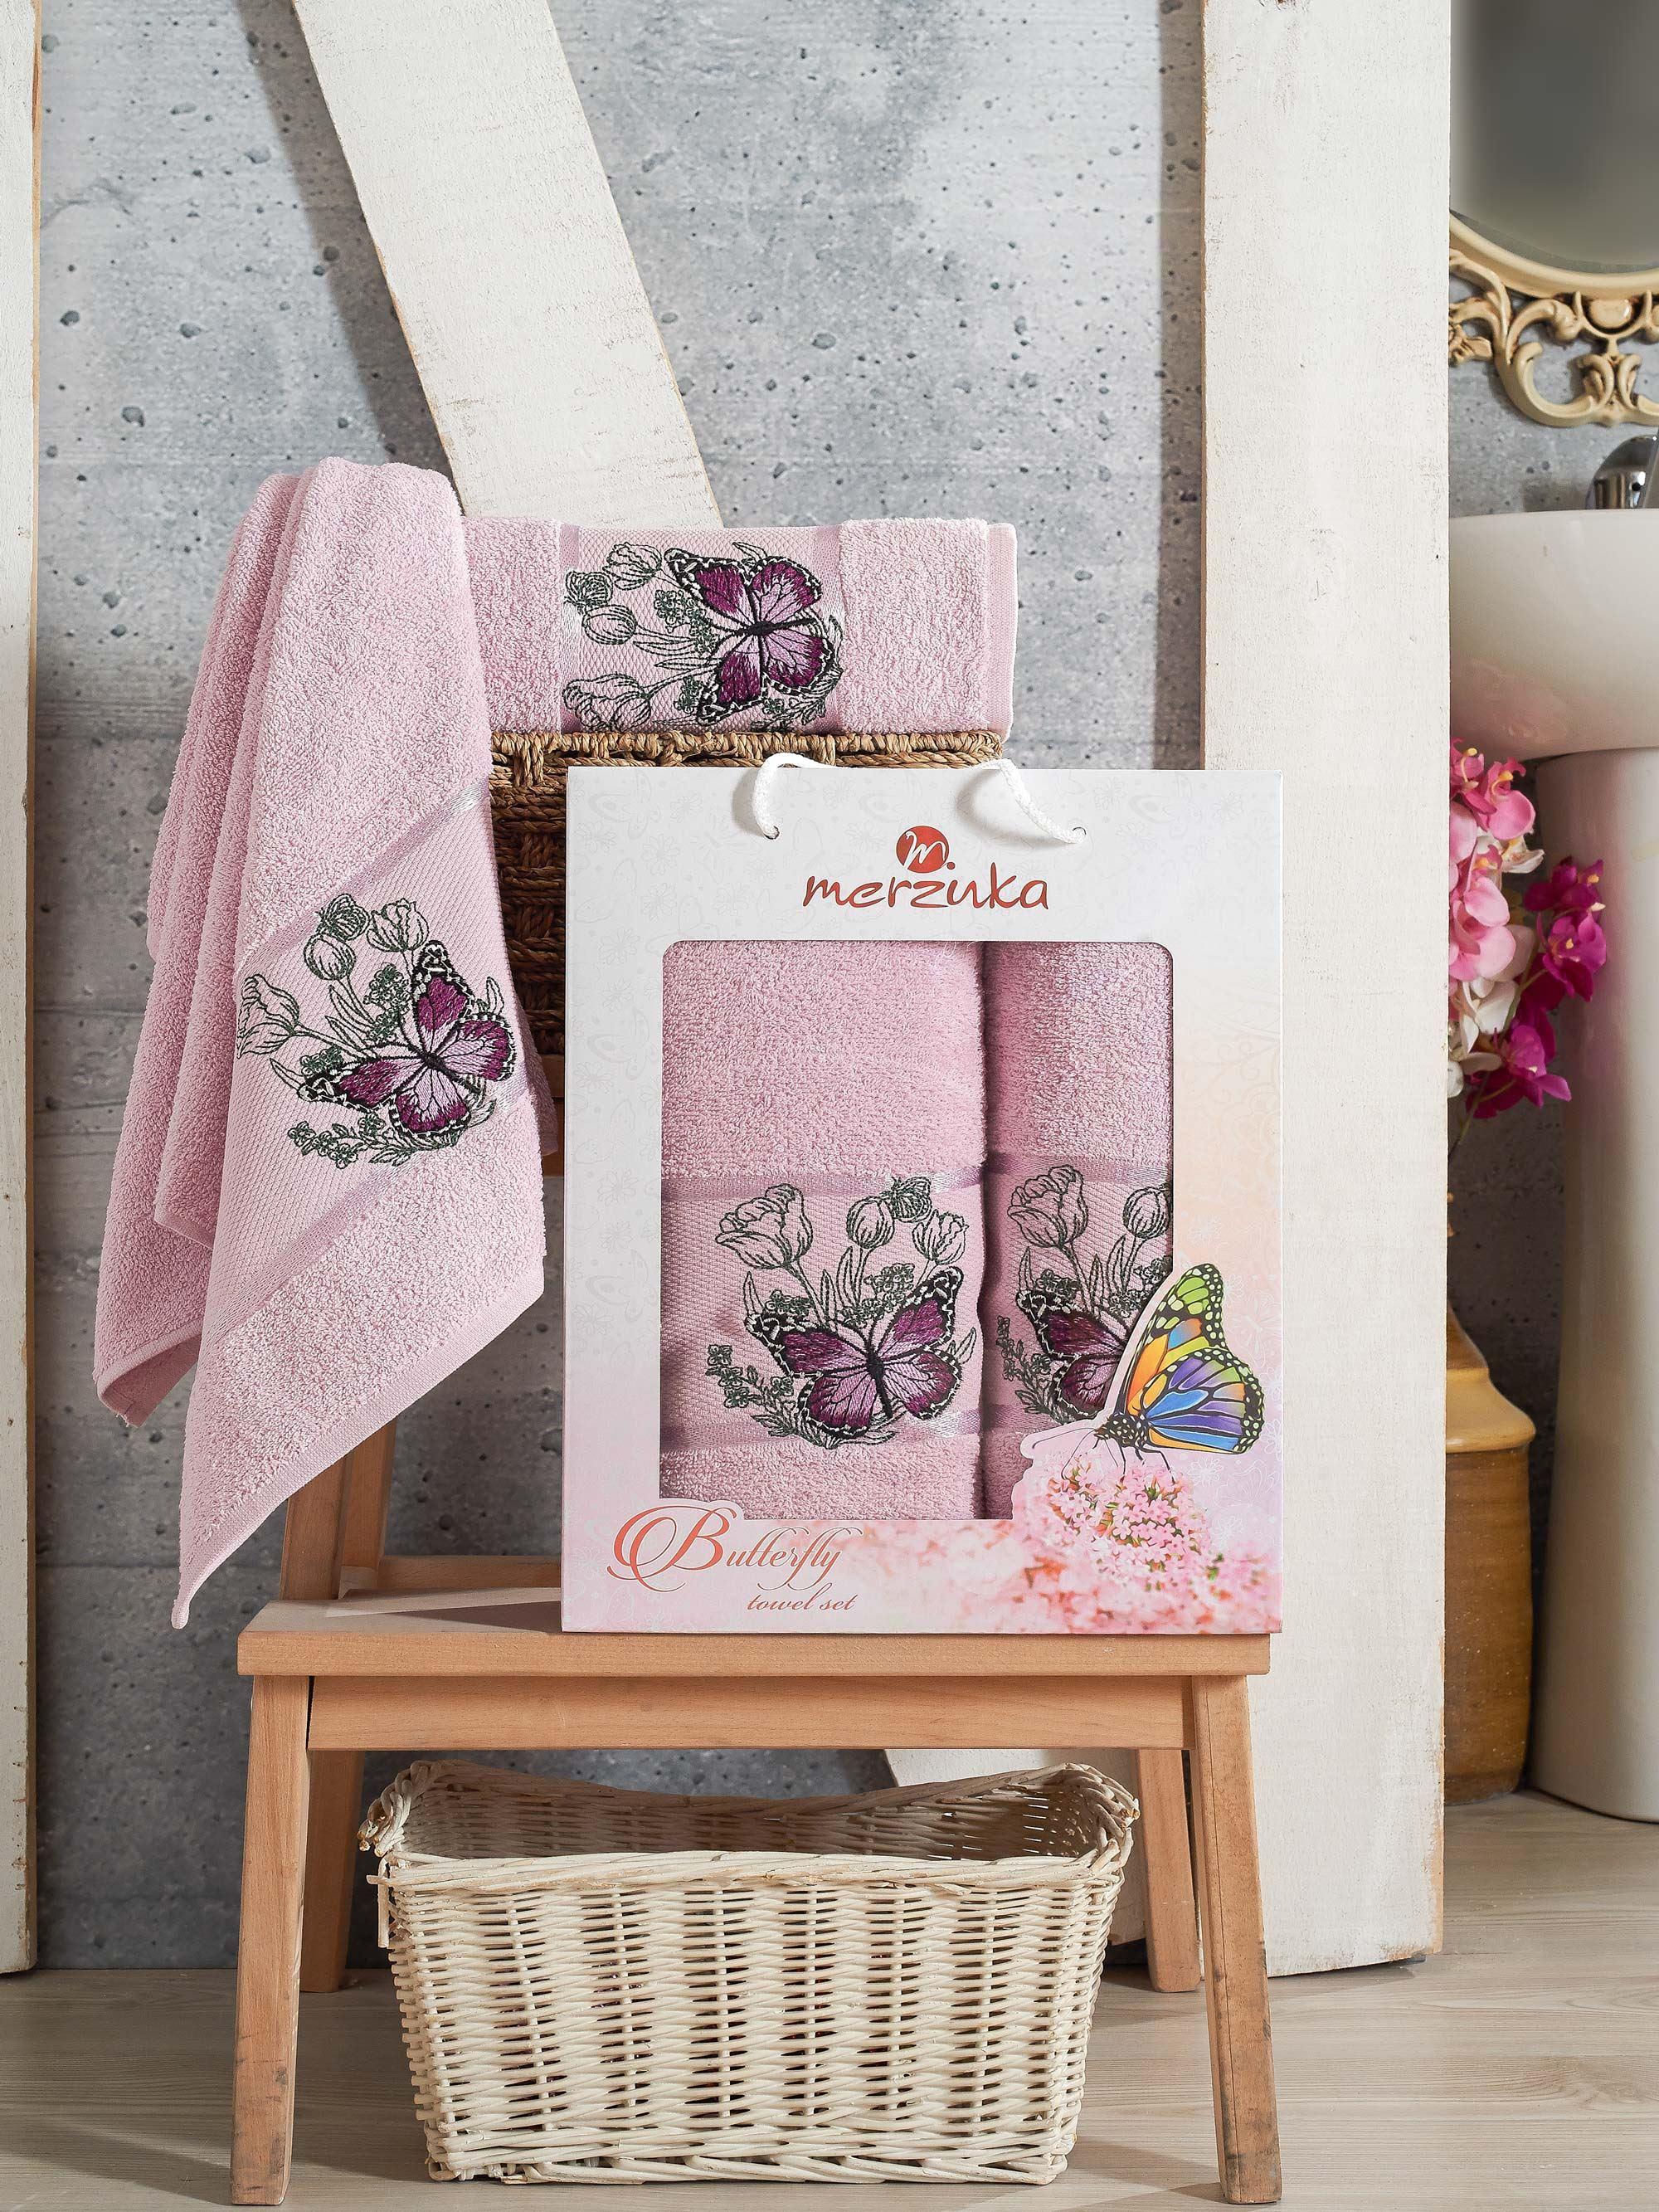 Полотенца Oran Merzuka Полотенце Butterfly Цвет: Светло-Лиловый (50х80 см,70х130 см) полотенца oran merzuka полотенце sakura цвет светло лиловый набор